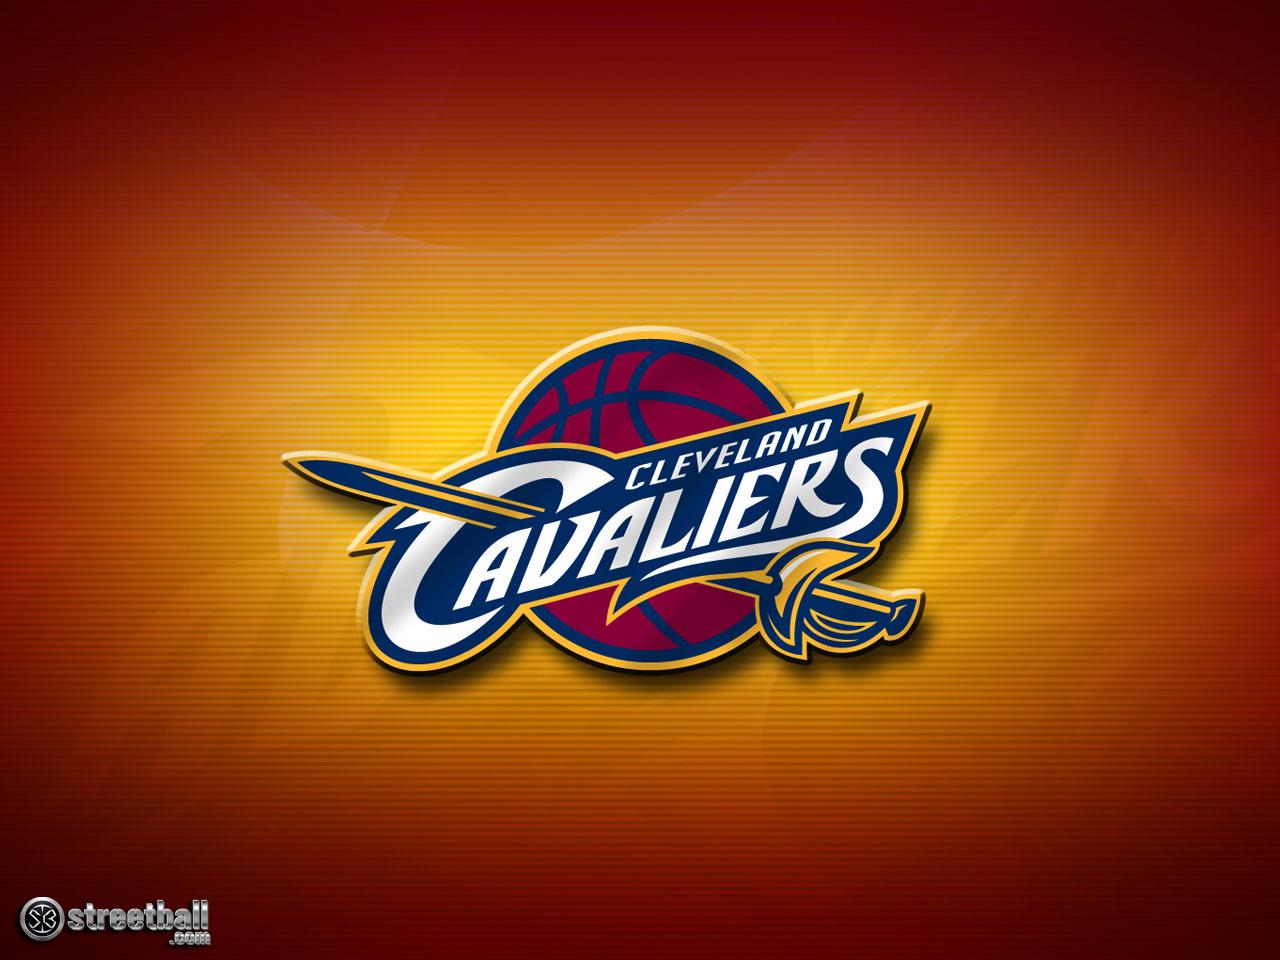 2014 Cavs Logo Cavaliers Wallpaper Logo Wallpaper Hd Nba Finals Game